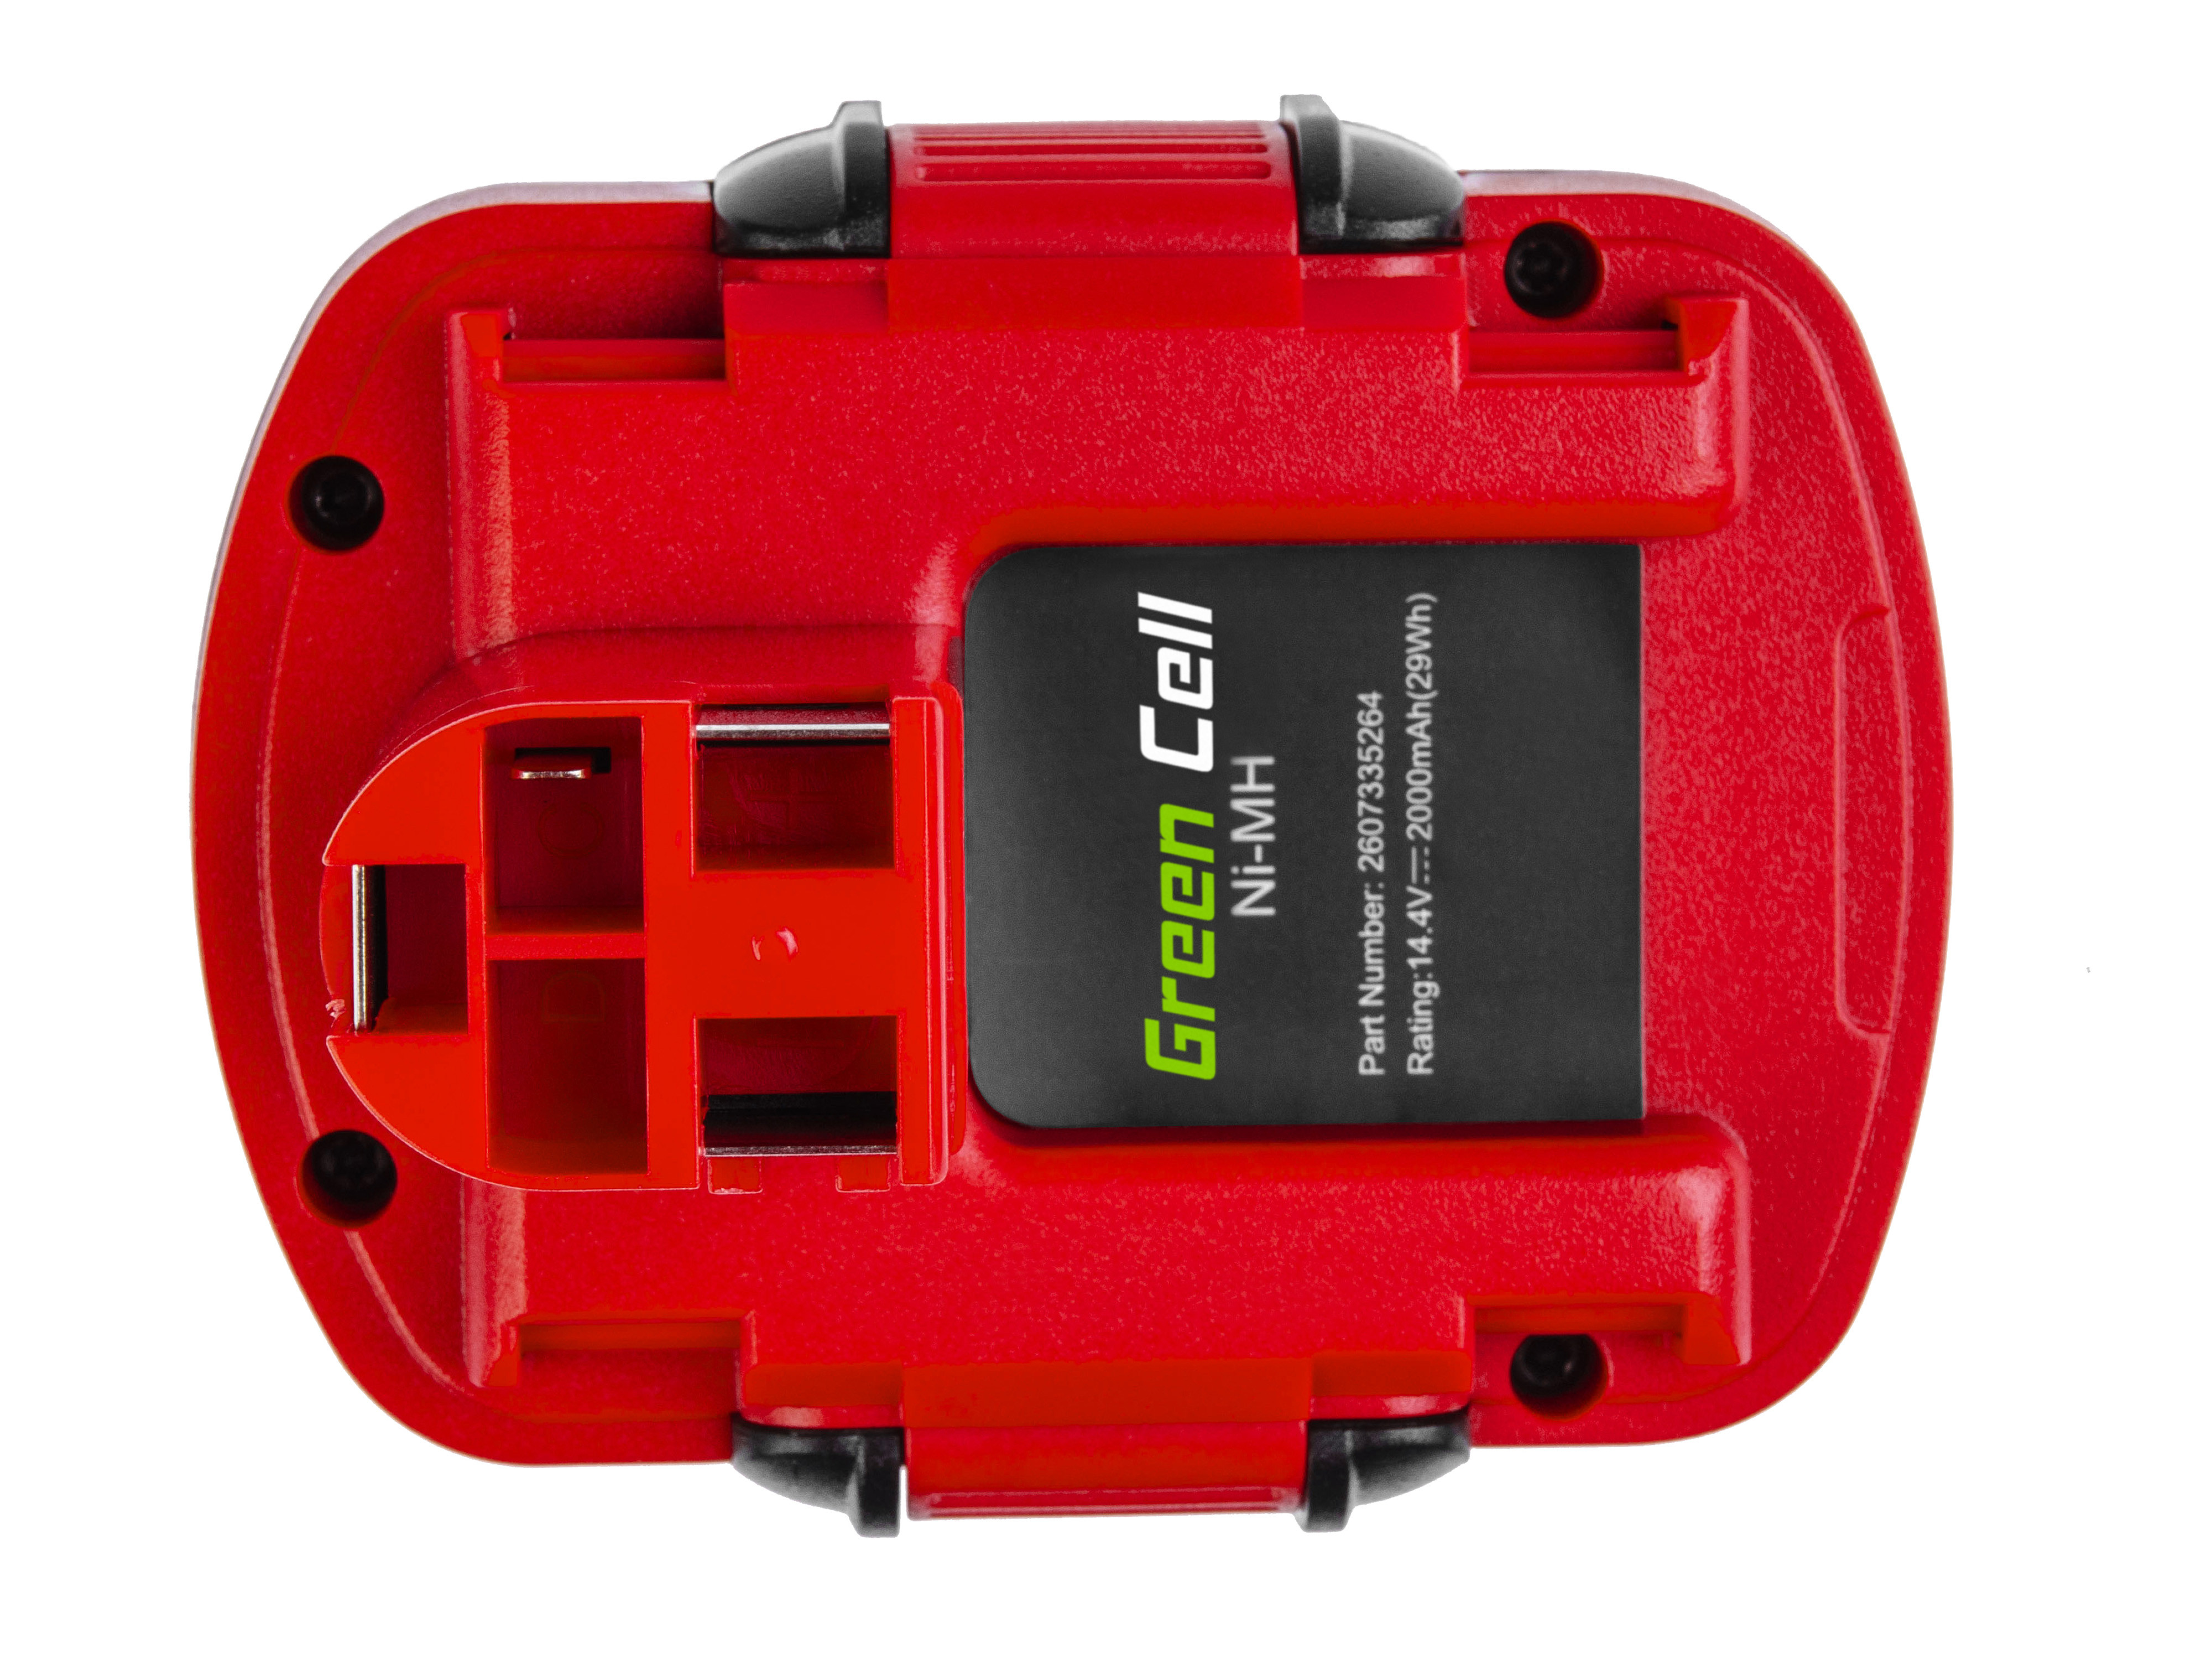 Baterie Green Cell Bosch GSR PSR 14,4V 2000mAh Ni-MH – neoriginální